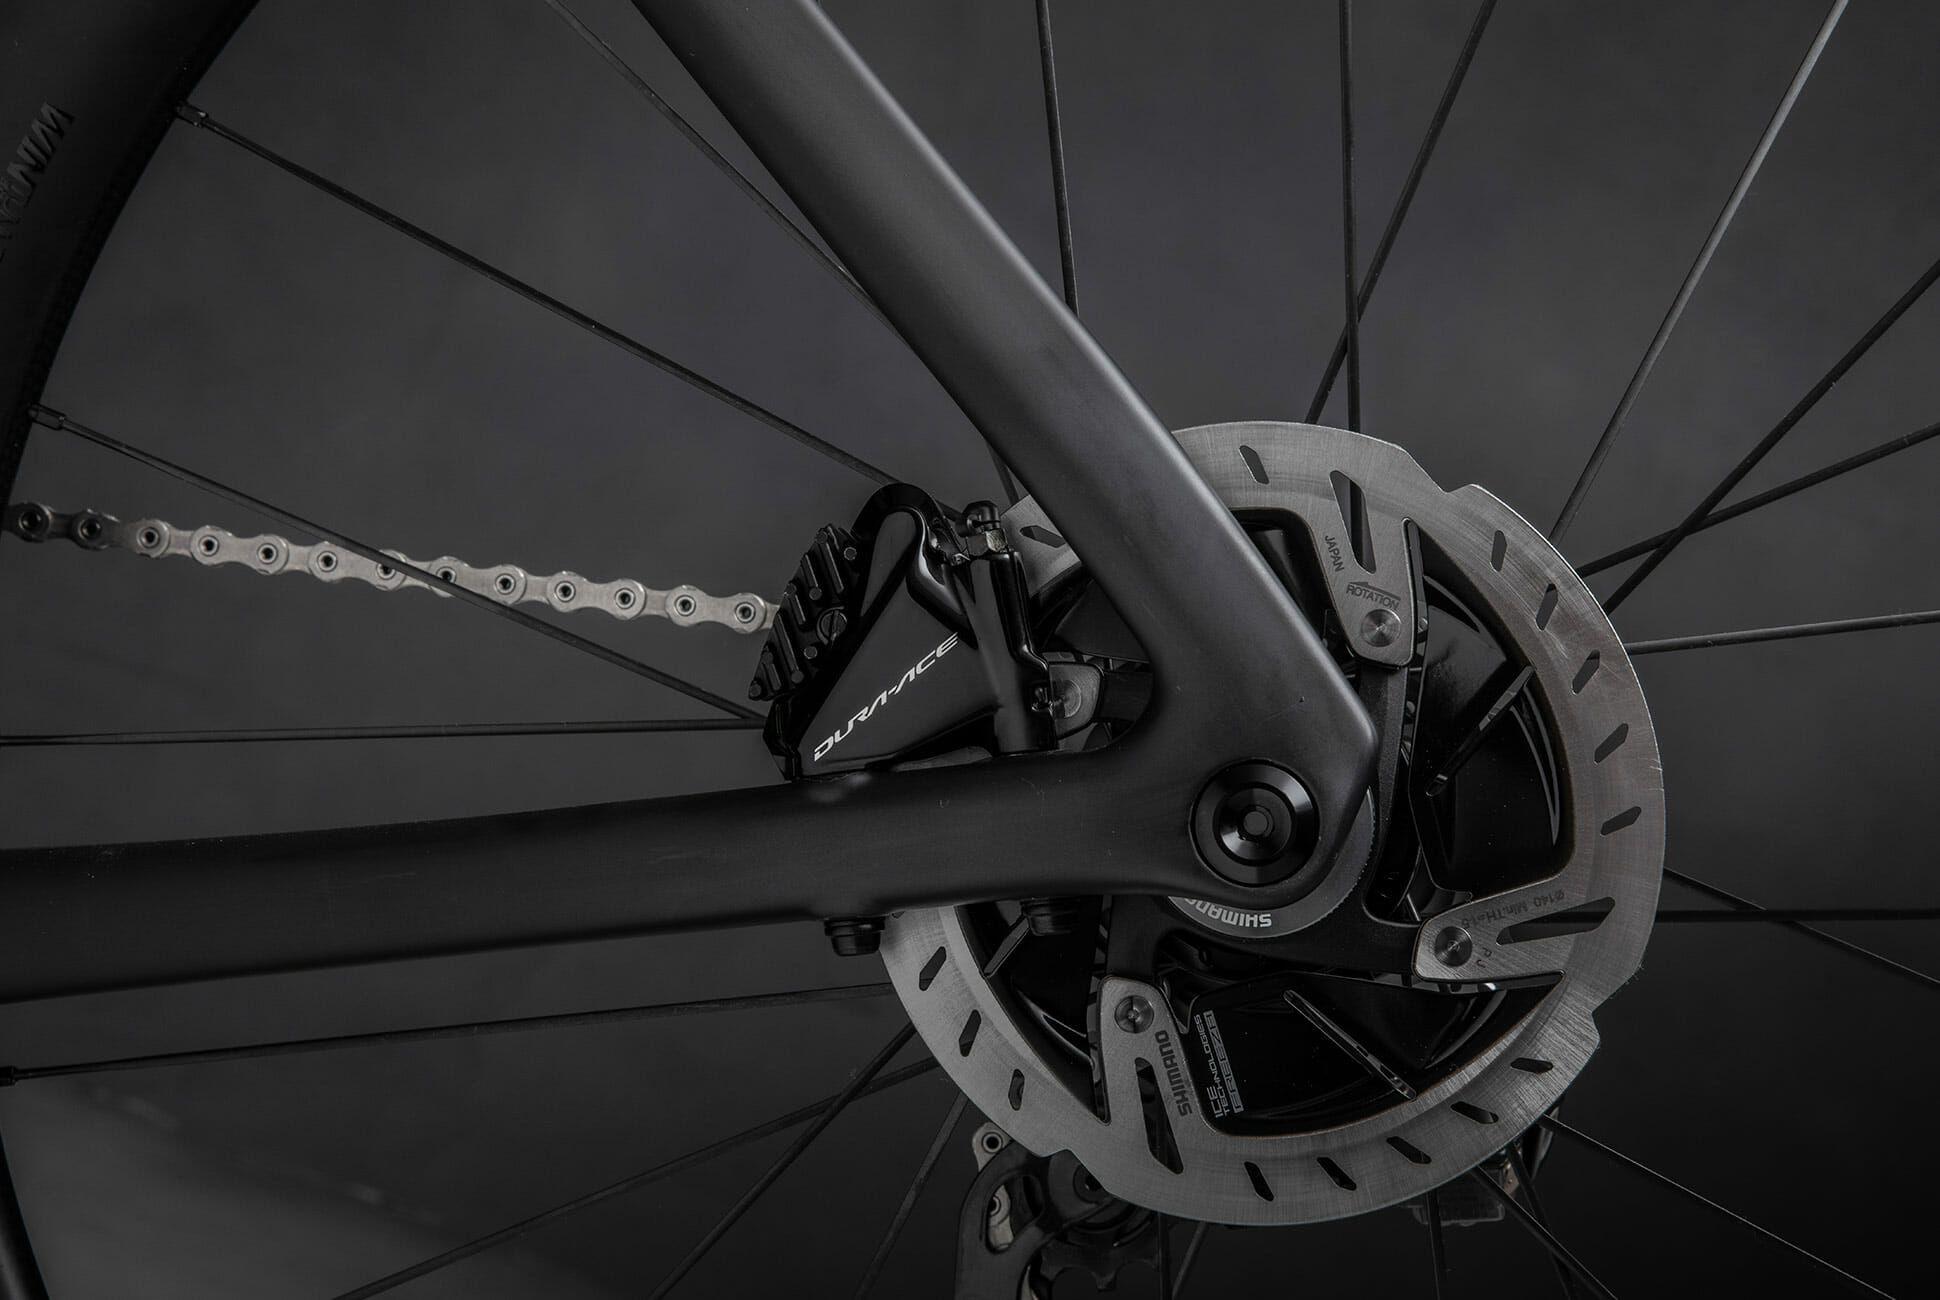 Specialized-S-Works-Venge-Road-Bike-gear-patrol-slide-9